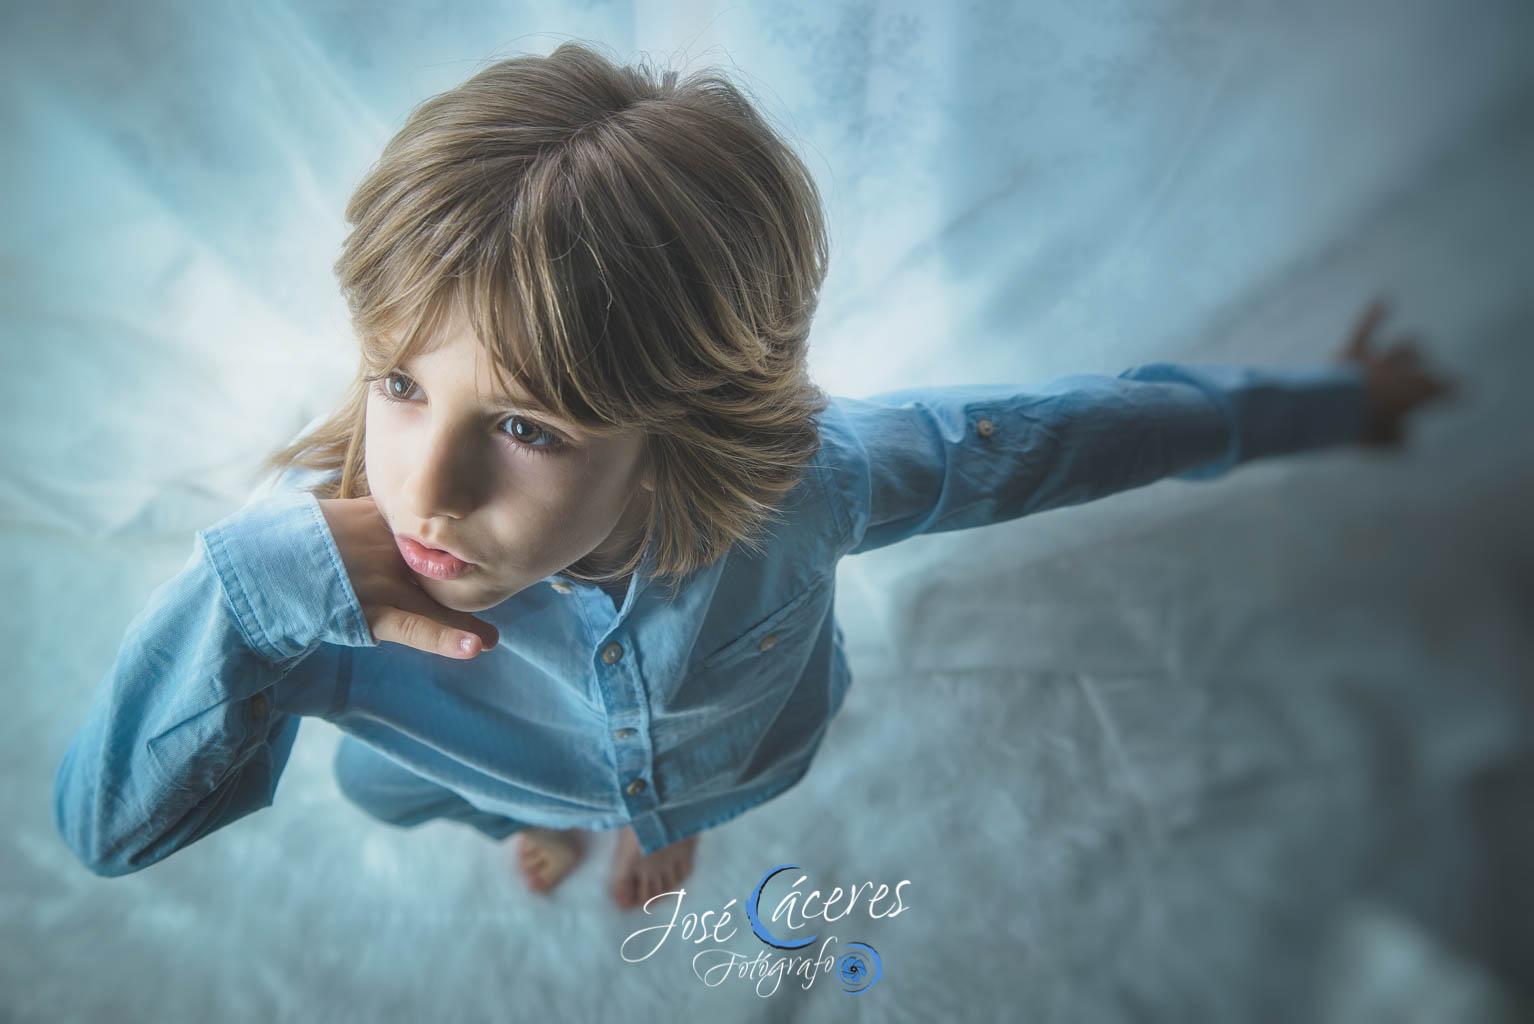 Jose Caceres Fotografia, Sesion Estudio Fotografia Niños-3